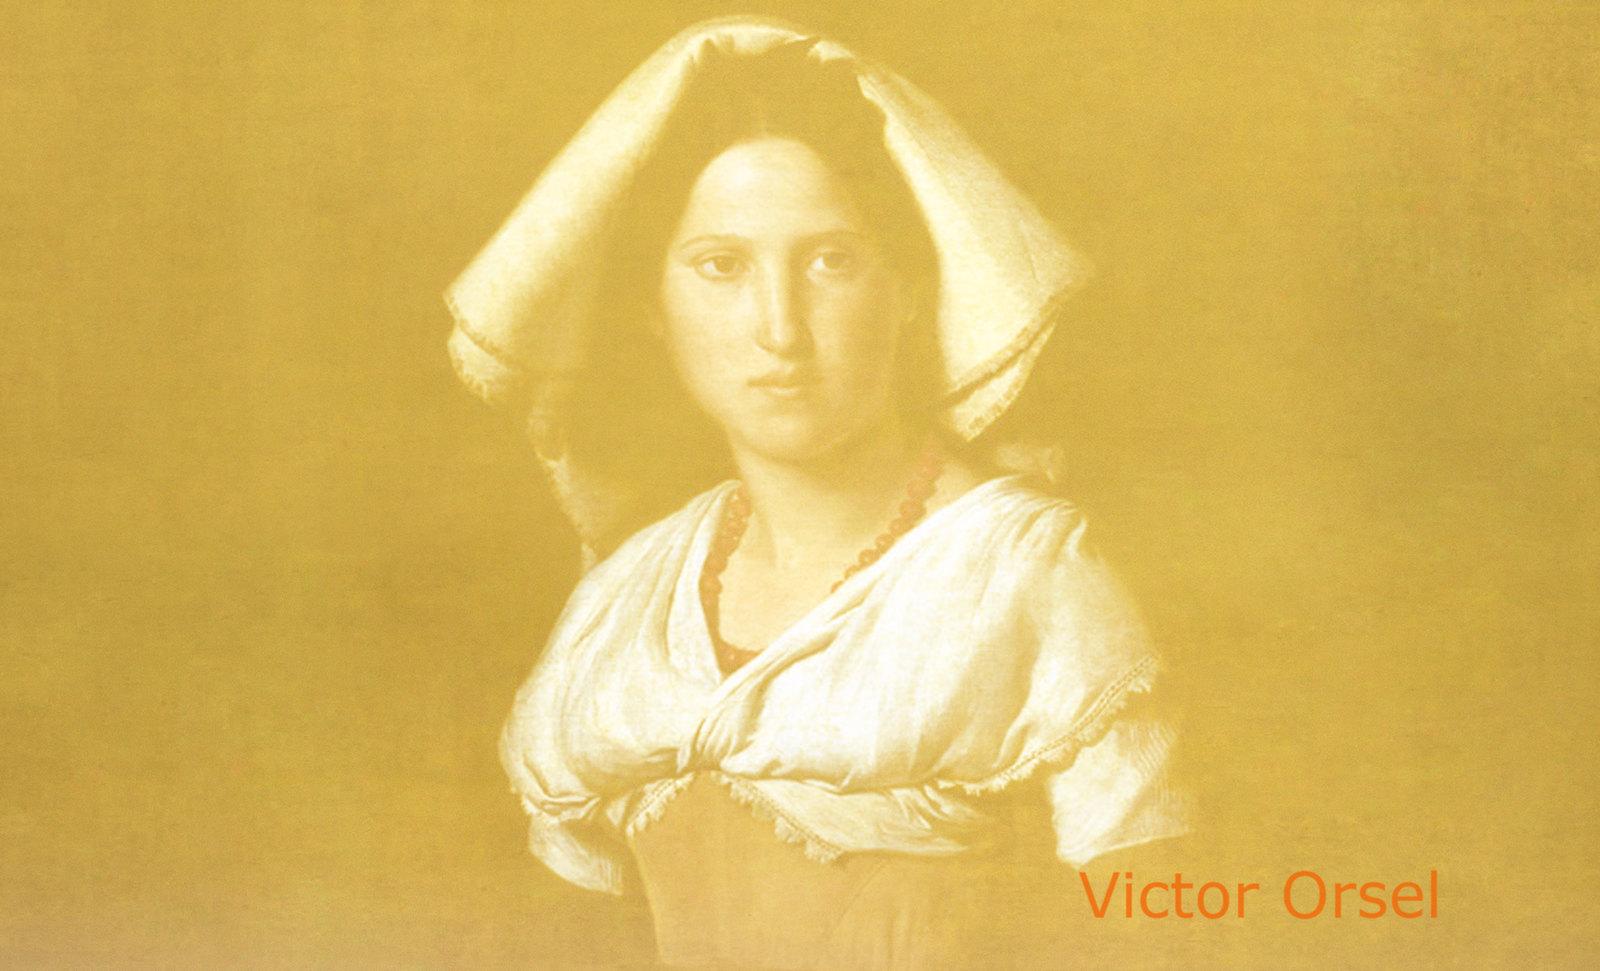 Vittoria Caldoni, idealización de Friedrich Overbeck (1824) y Víctor Orsel (1826), ensamble de Pablo Picasso (1953).